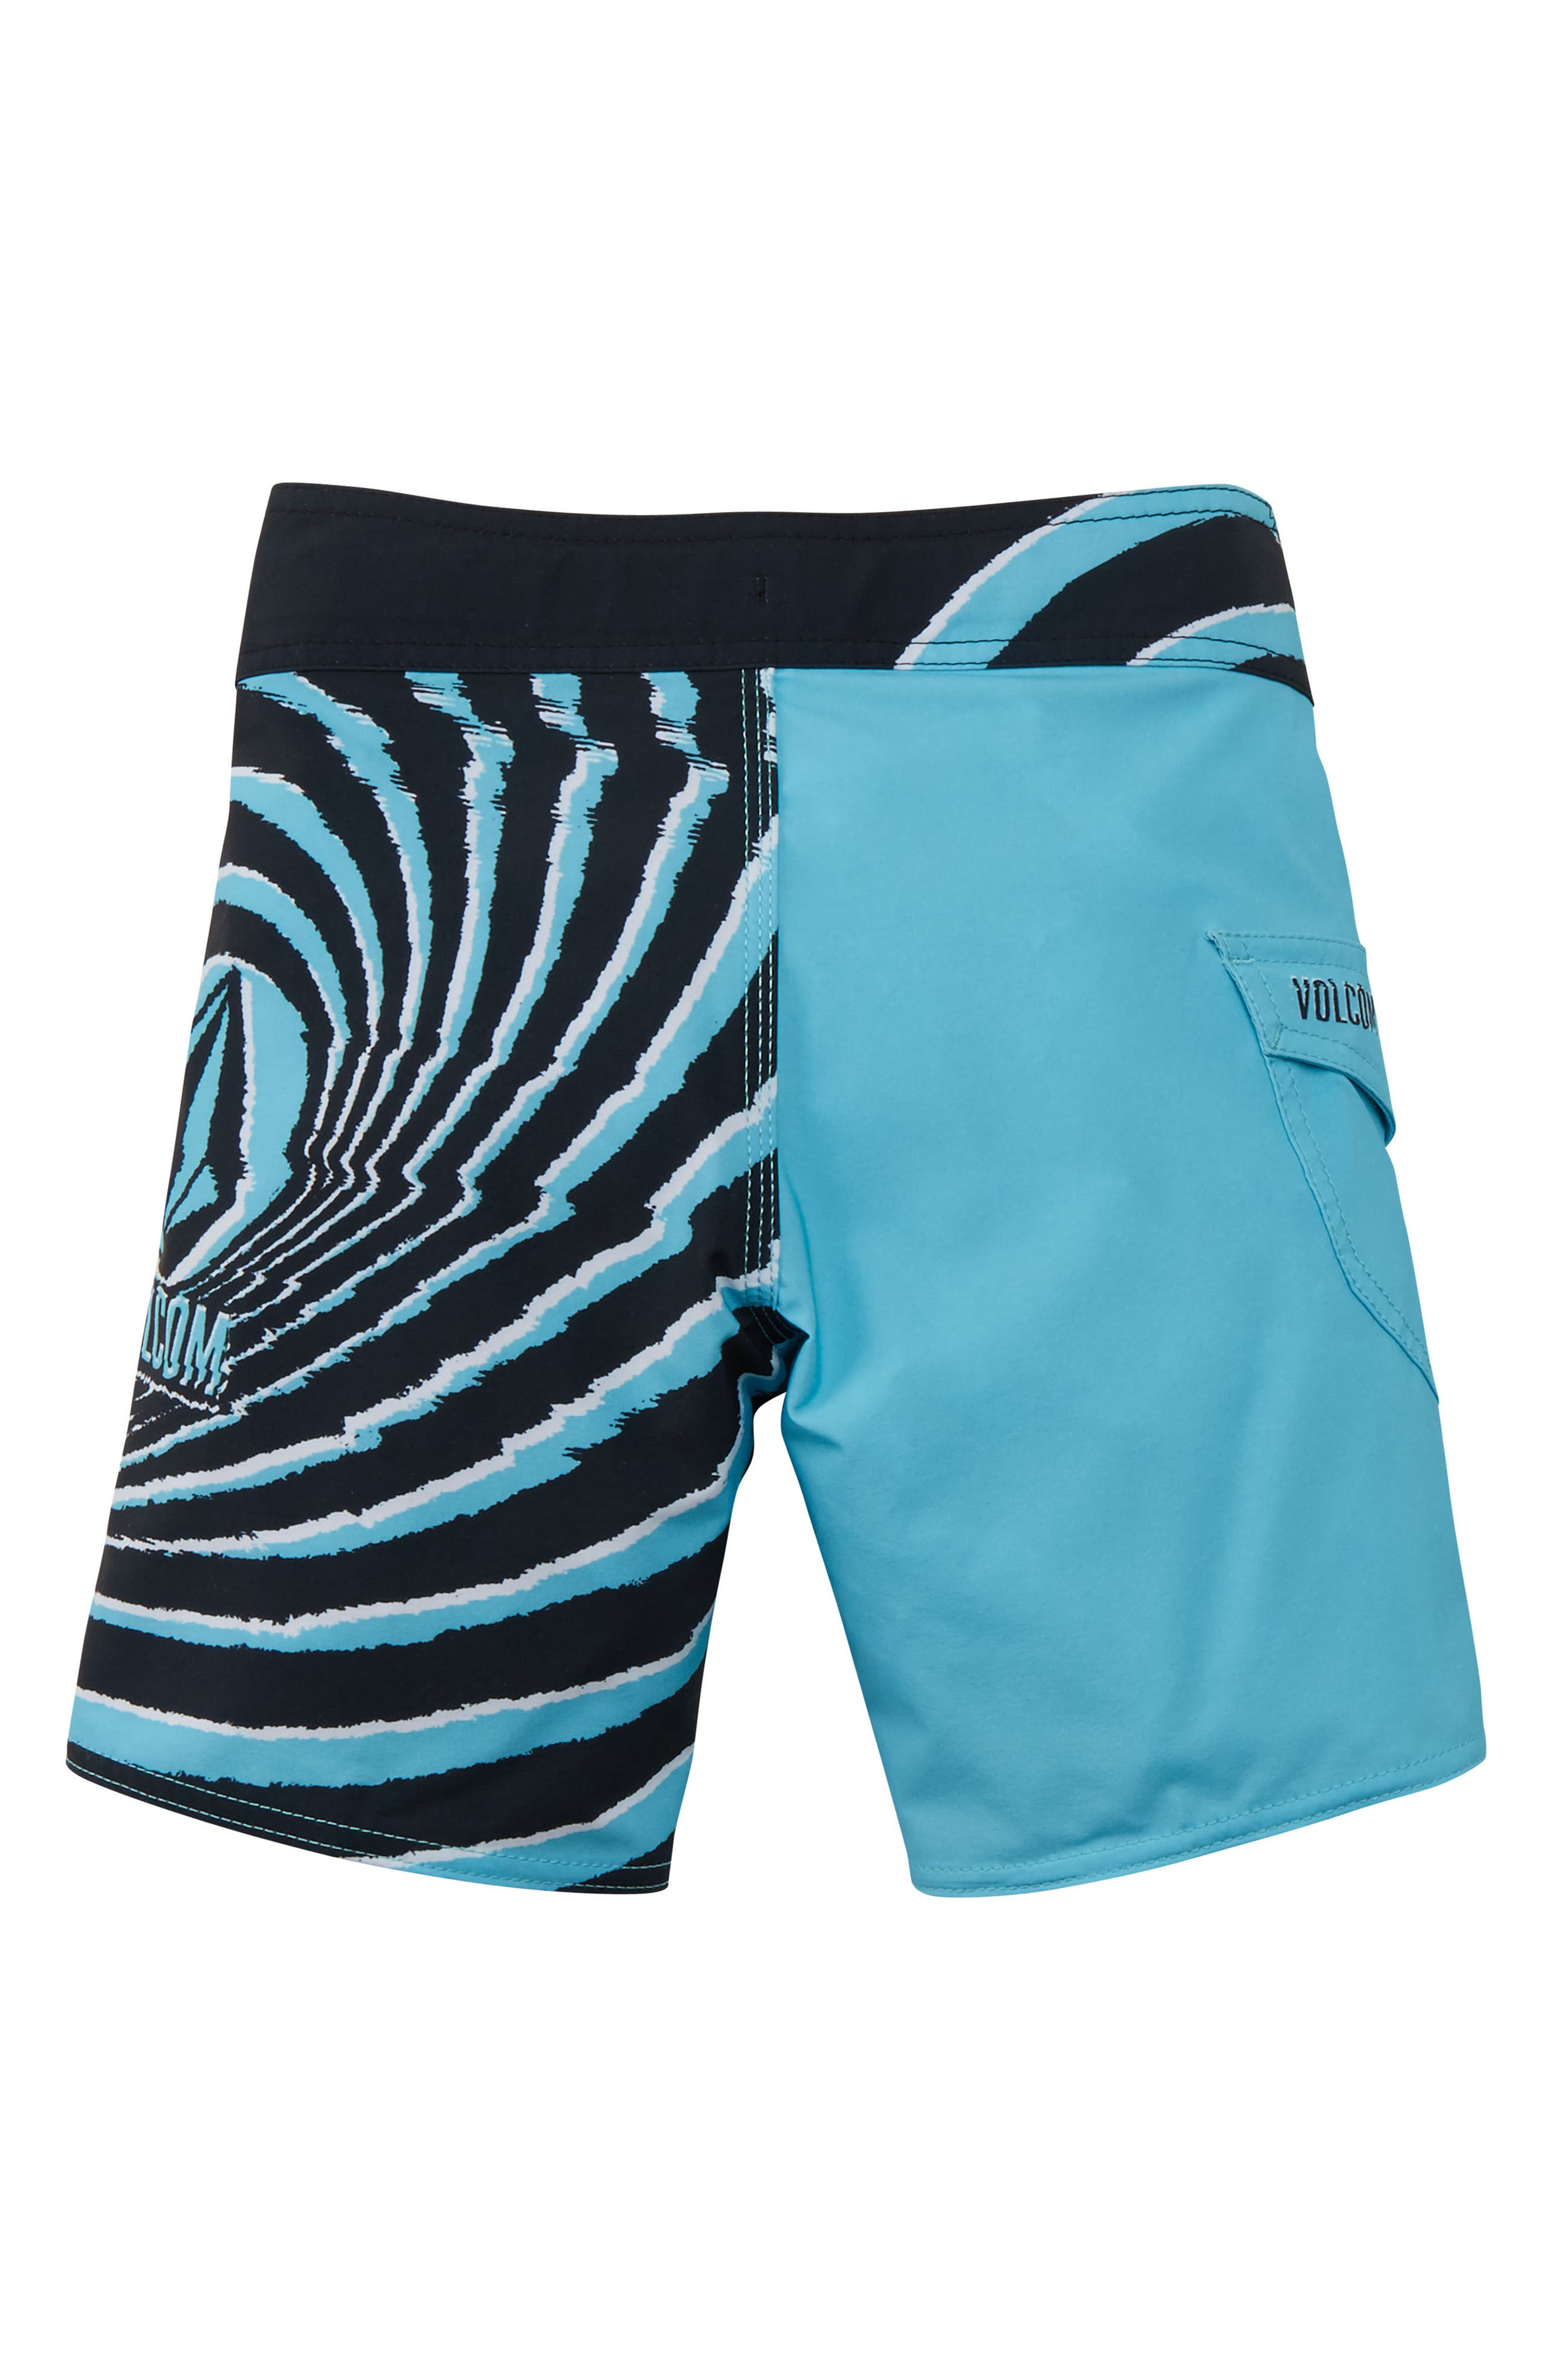 Lido Block Mod Board Shorts,                             Alternate thumbnail 2, color,                             470